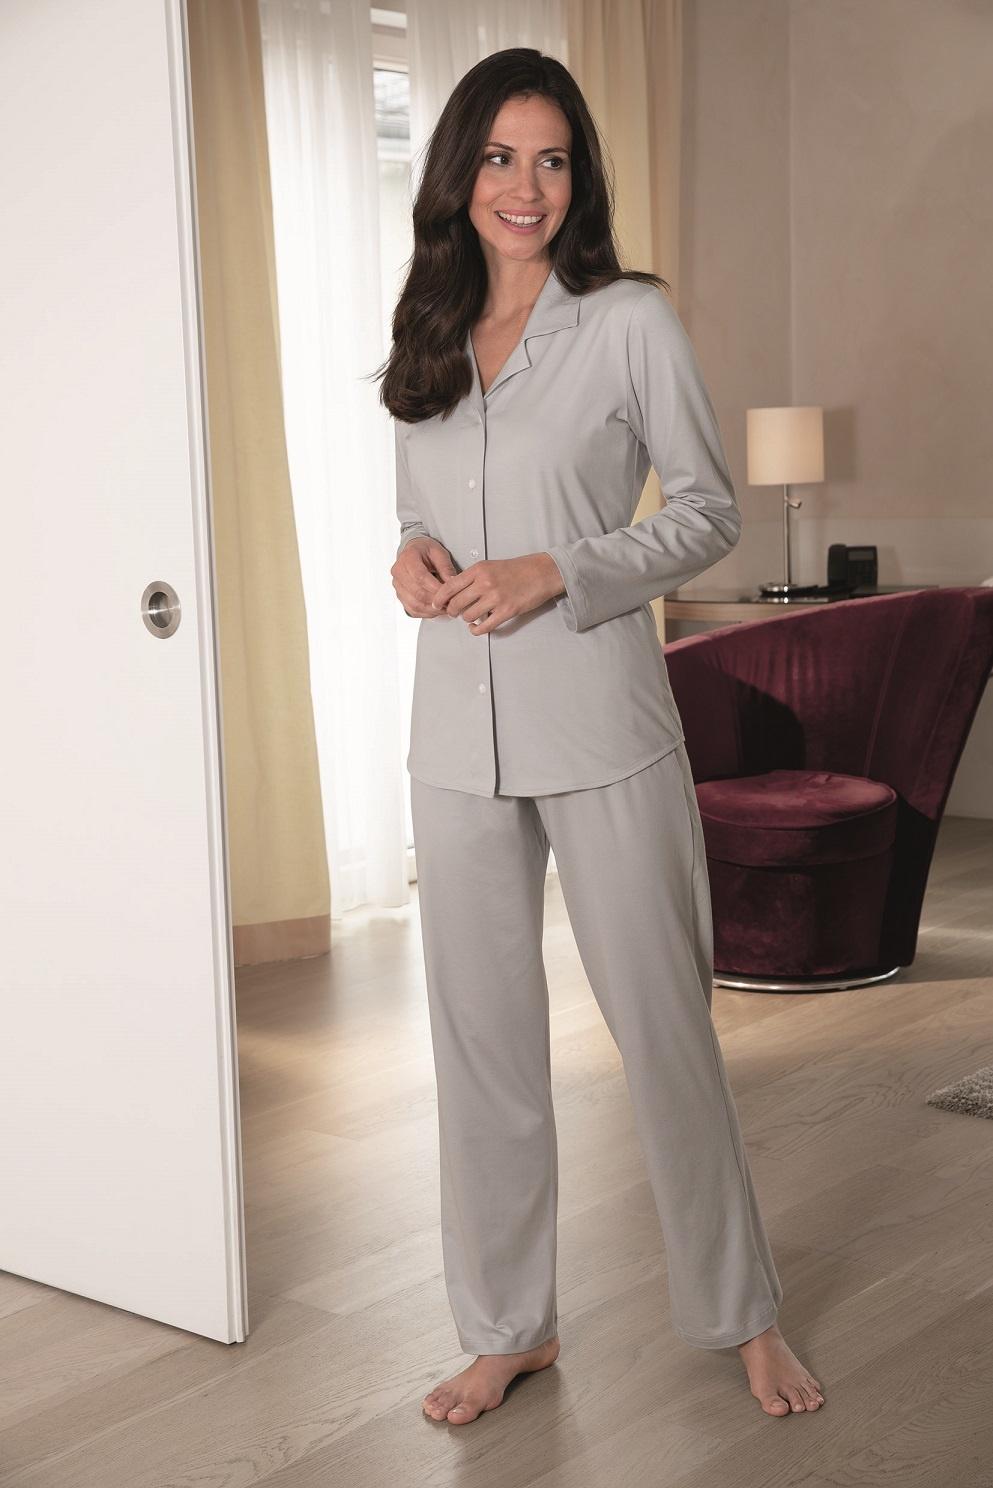 11c2006b79 Novila|Damen Pyjama|Damen Schlafanzug Jersey|Textile Träume ...